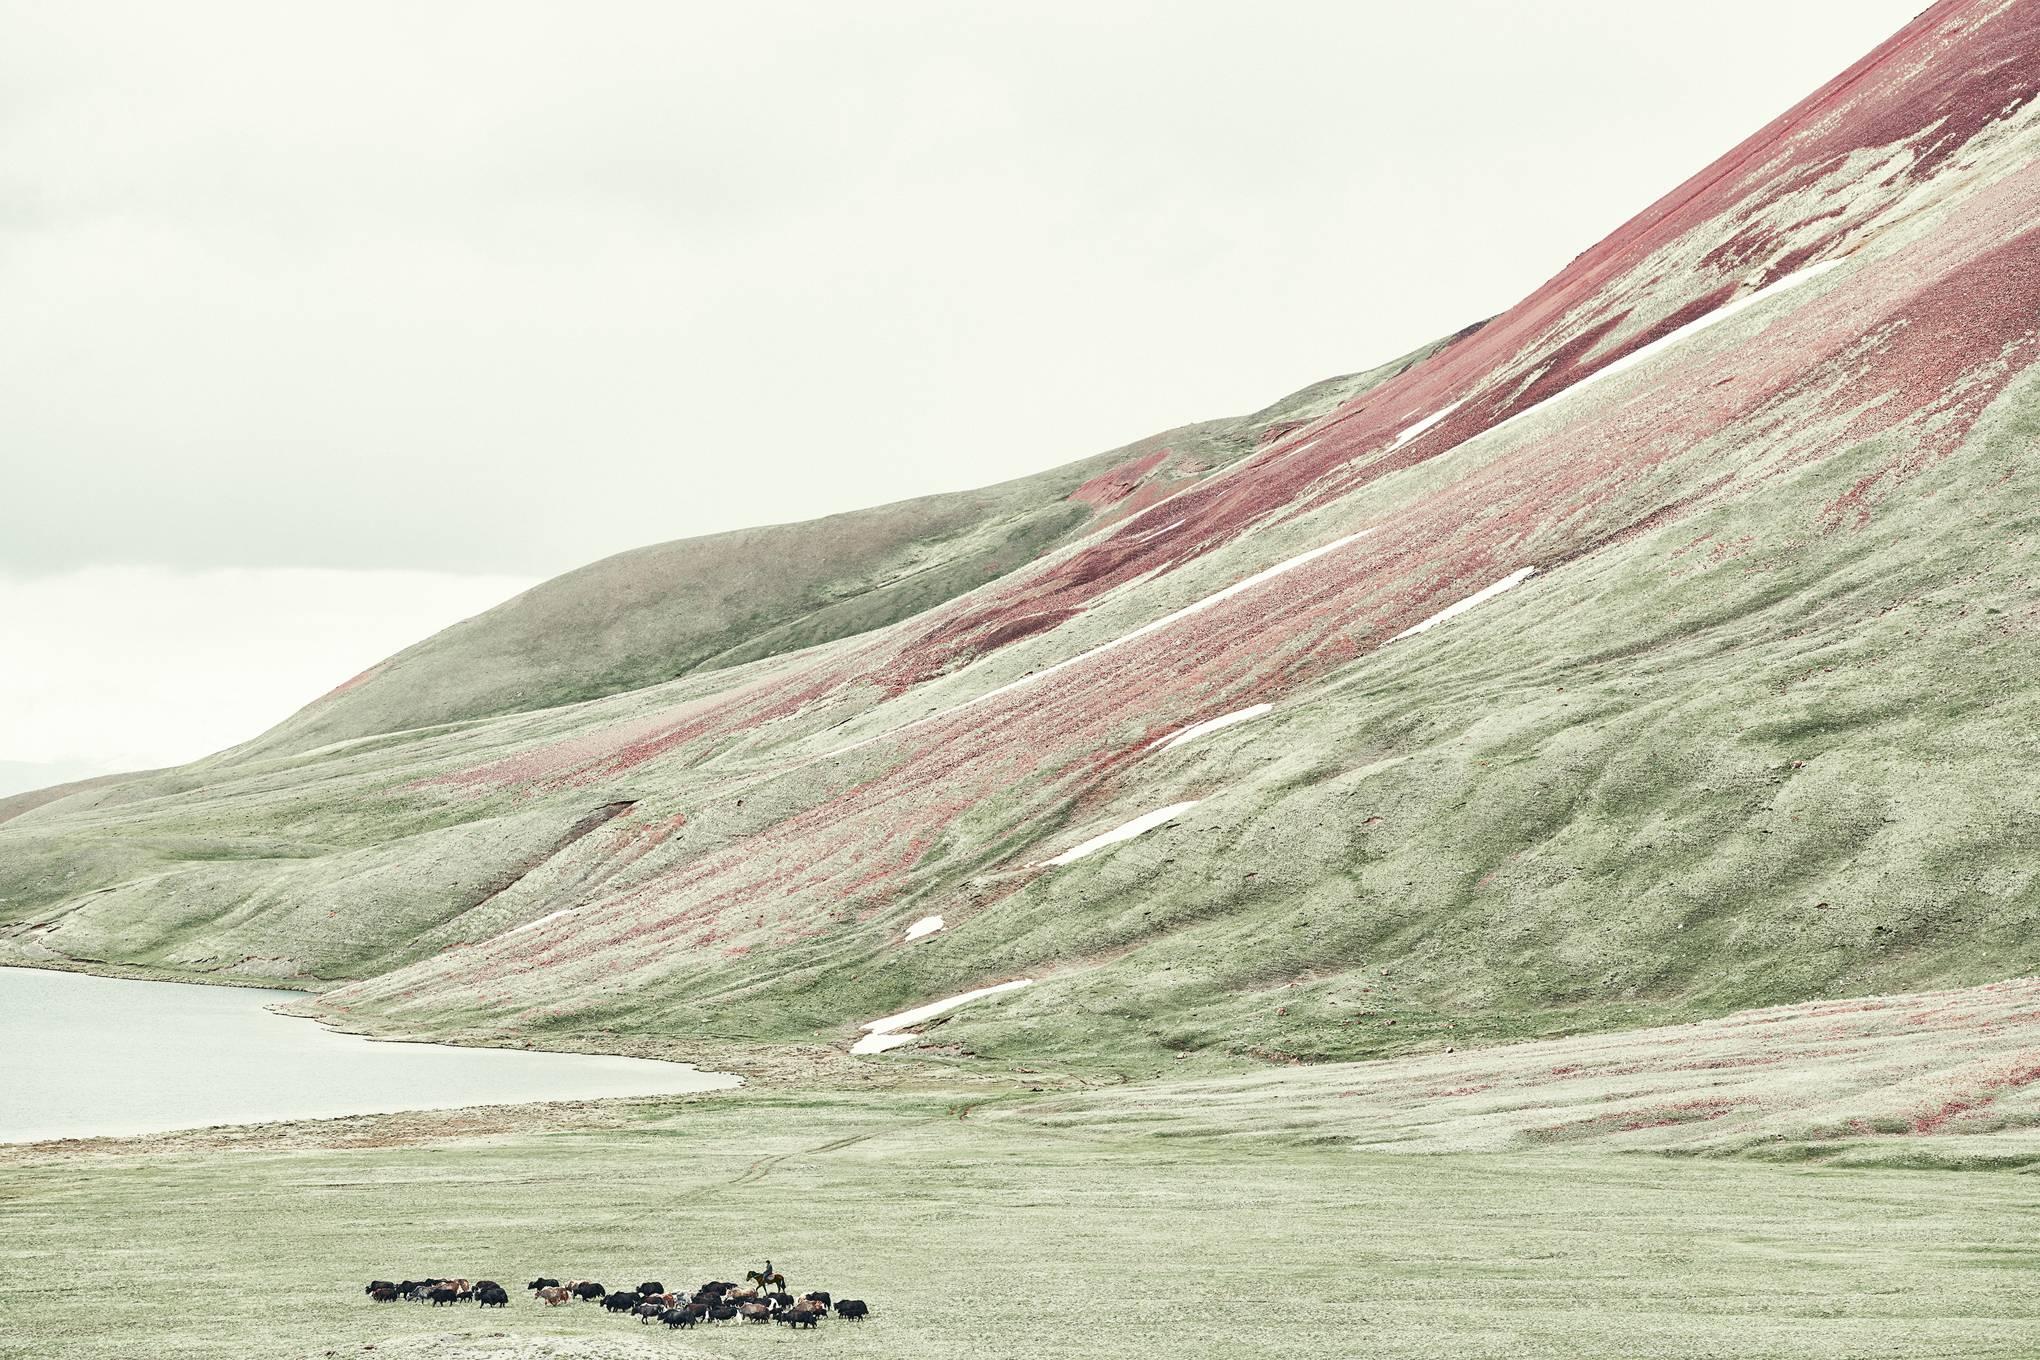 Inside the lives of Kyrgyzstan's nomadic herders